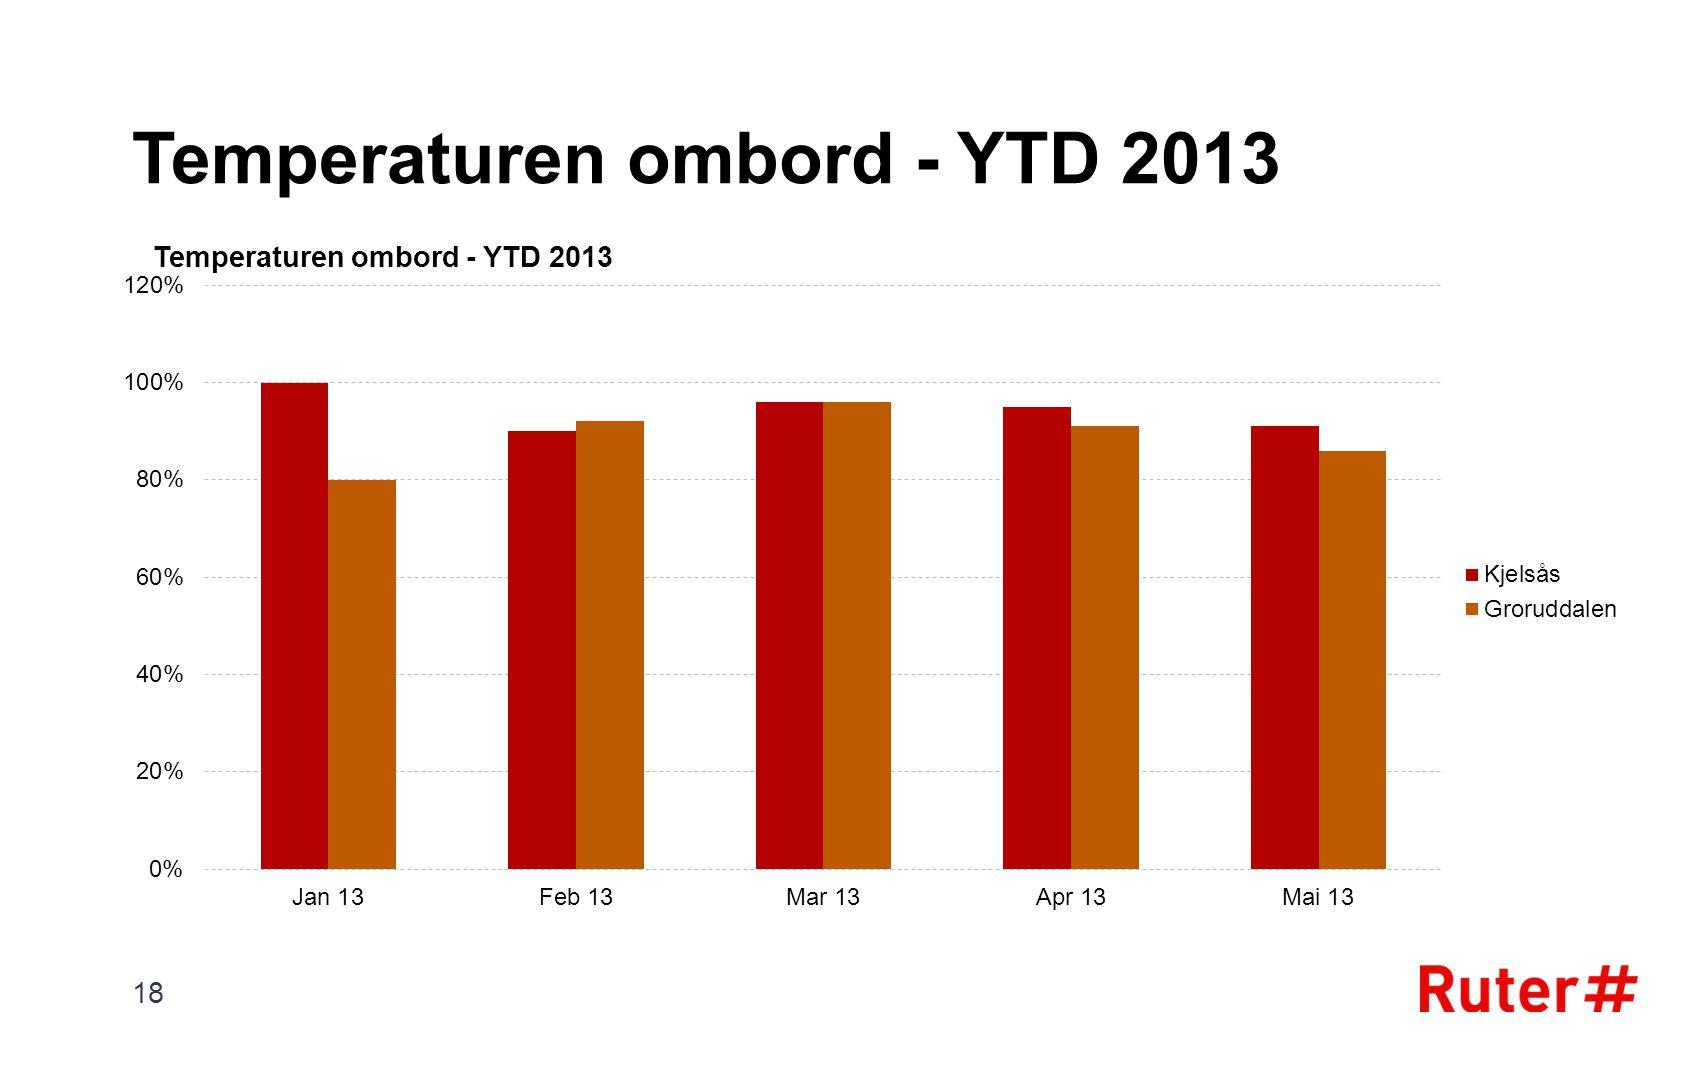 Temperaturen ombord - YTD 2013 18